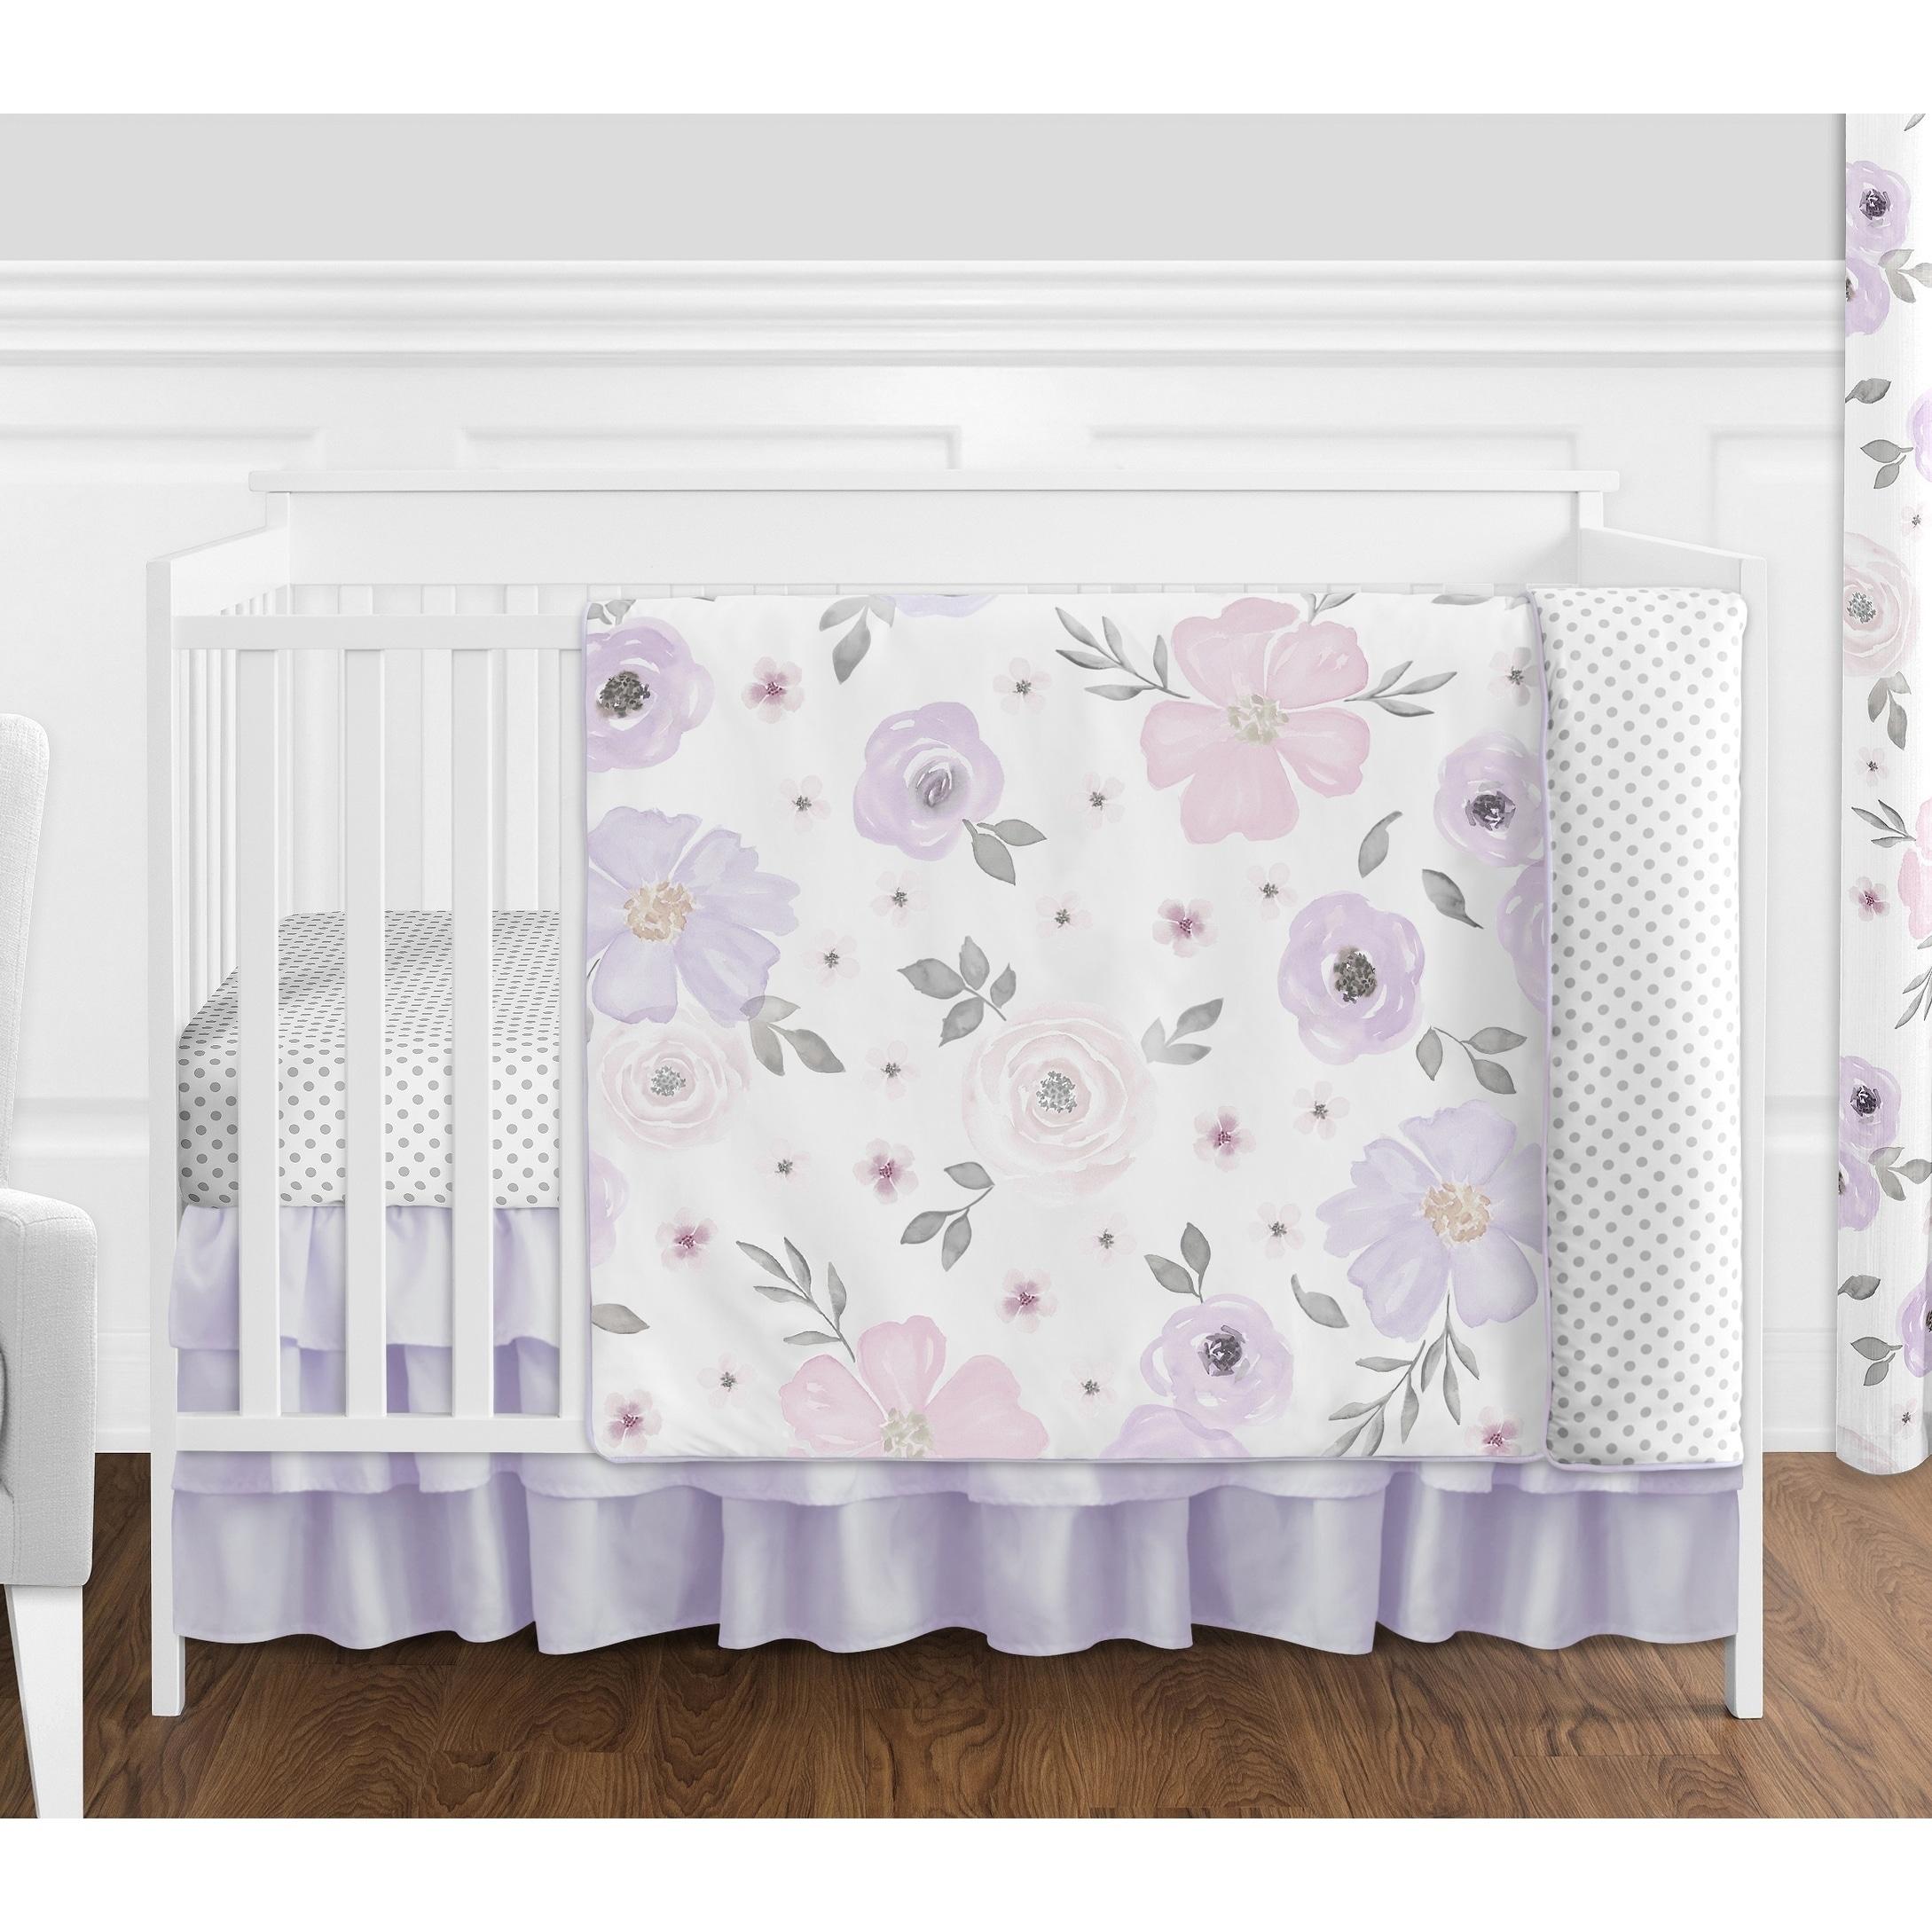 Bedding Sets New 7 Pcs Baby Bedding Set Crib Bed Set Cartoon Little Dog Baby Crib Set Quilt Bumper Sheet Skirt